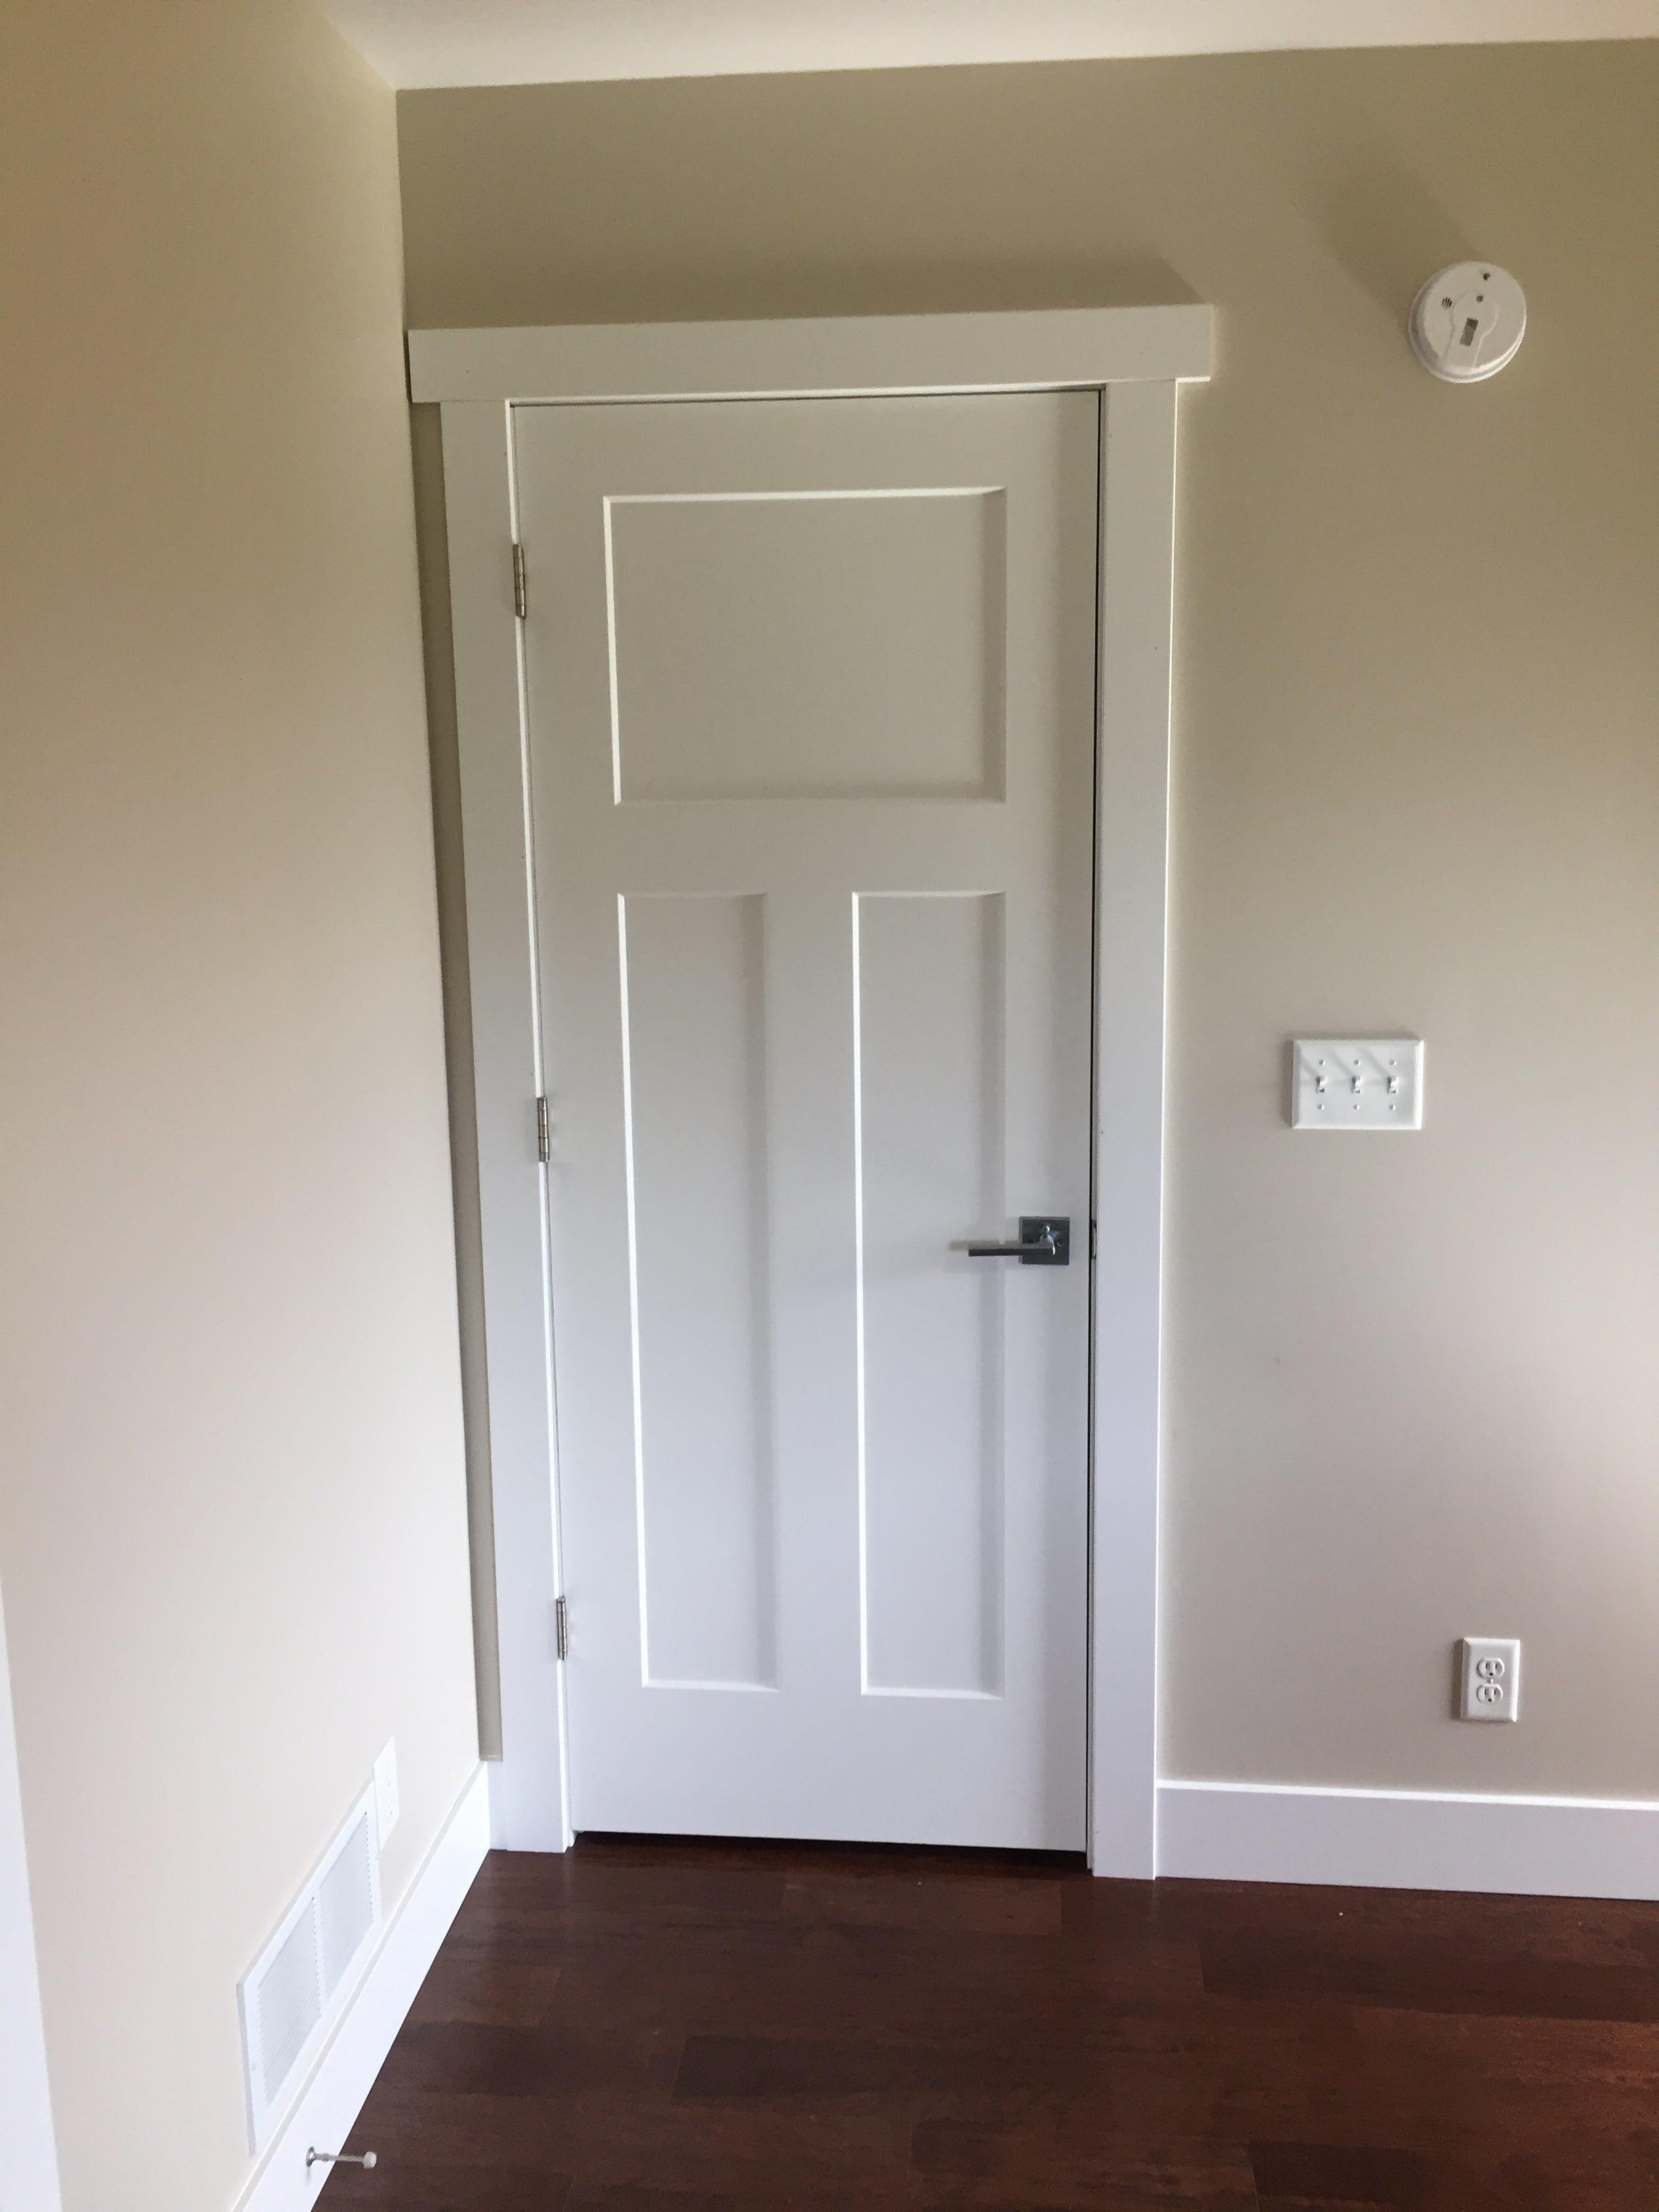 Replacing Door Trim : replacing, Install, Pre-Hung, Interior, EZ-Hang